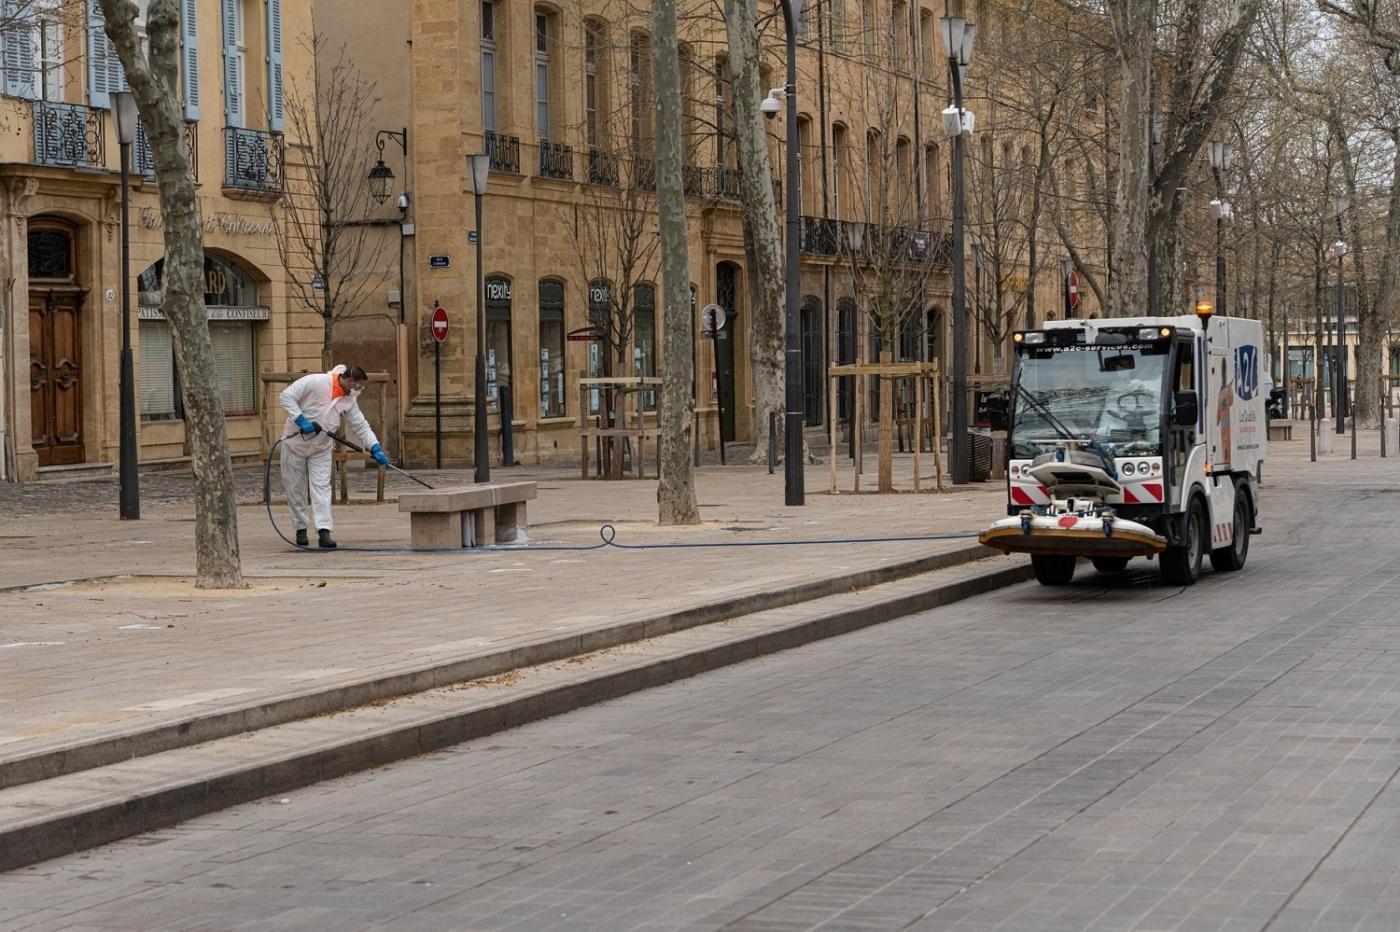 , Covid-19 : Aix-en-Provence a lancé la désinfection de ses rues, Made in Marseille, Made in Marseille